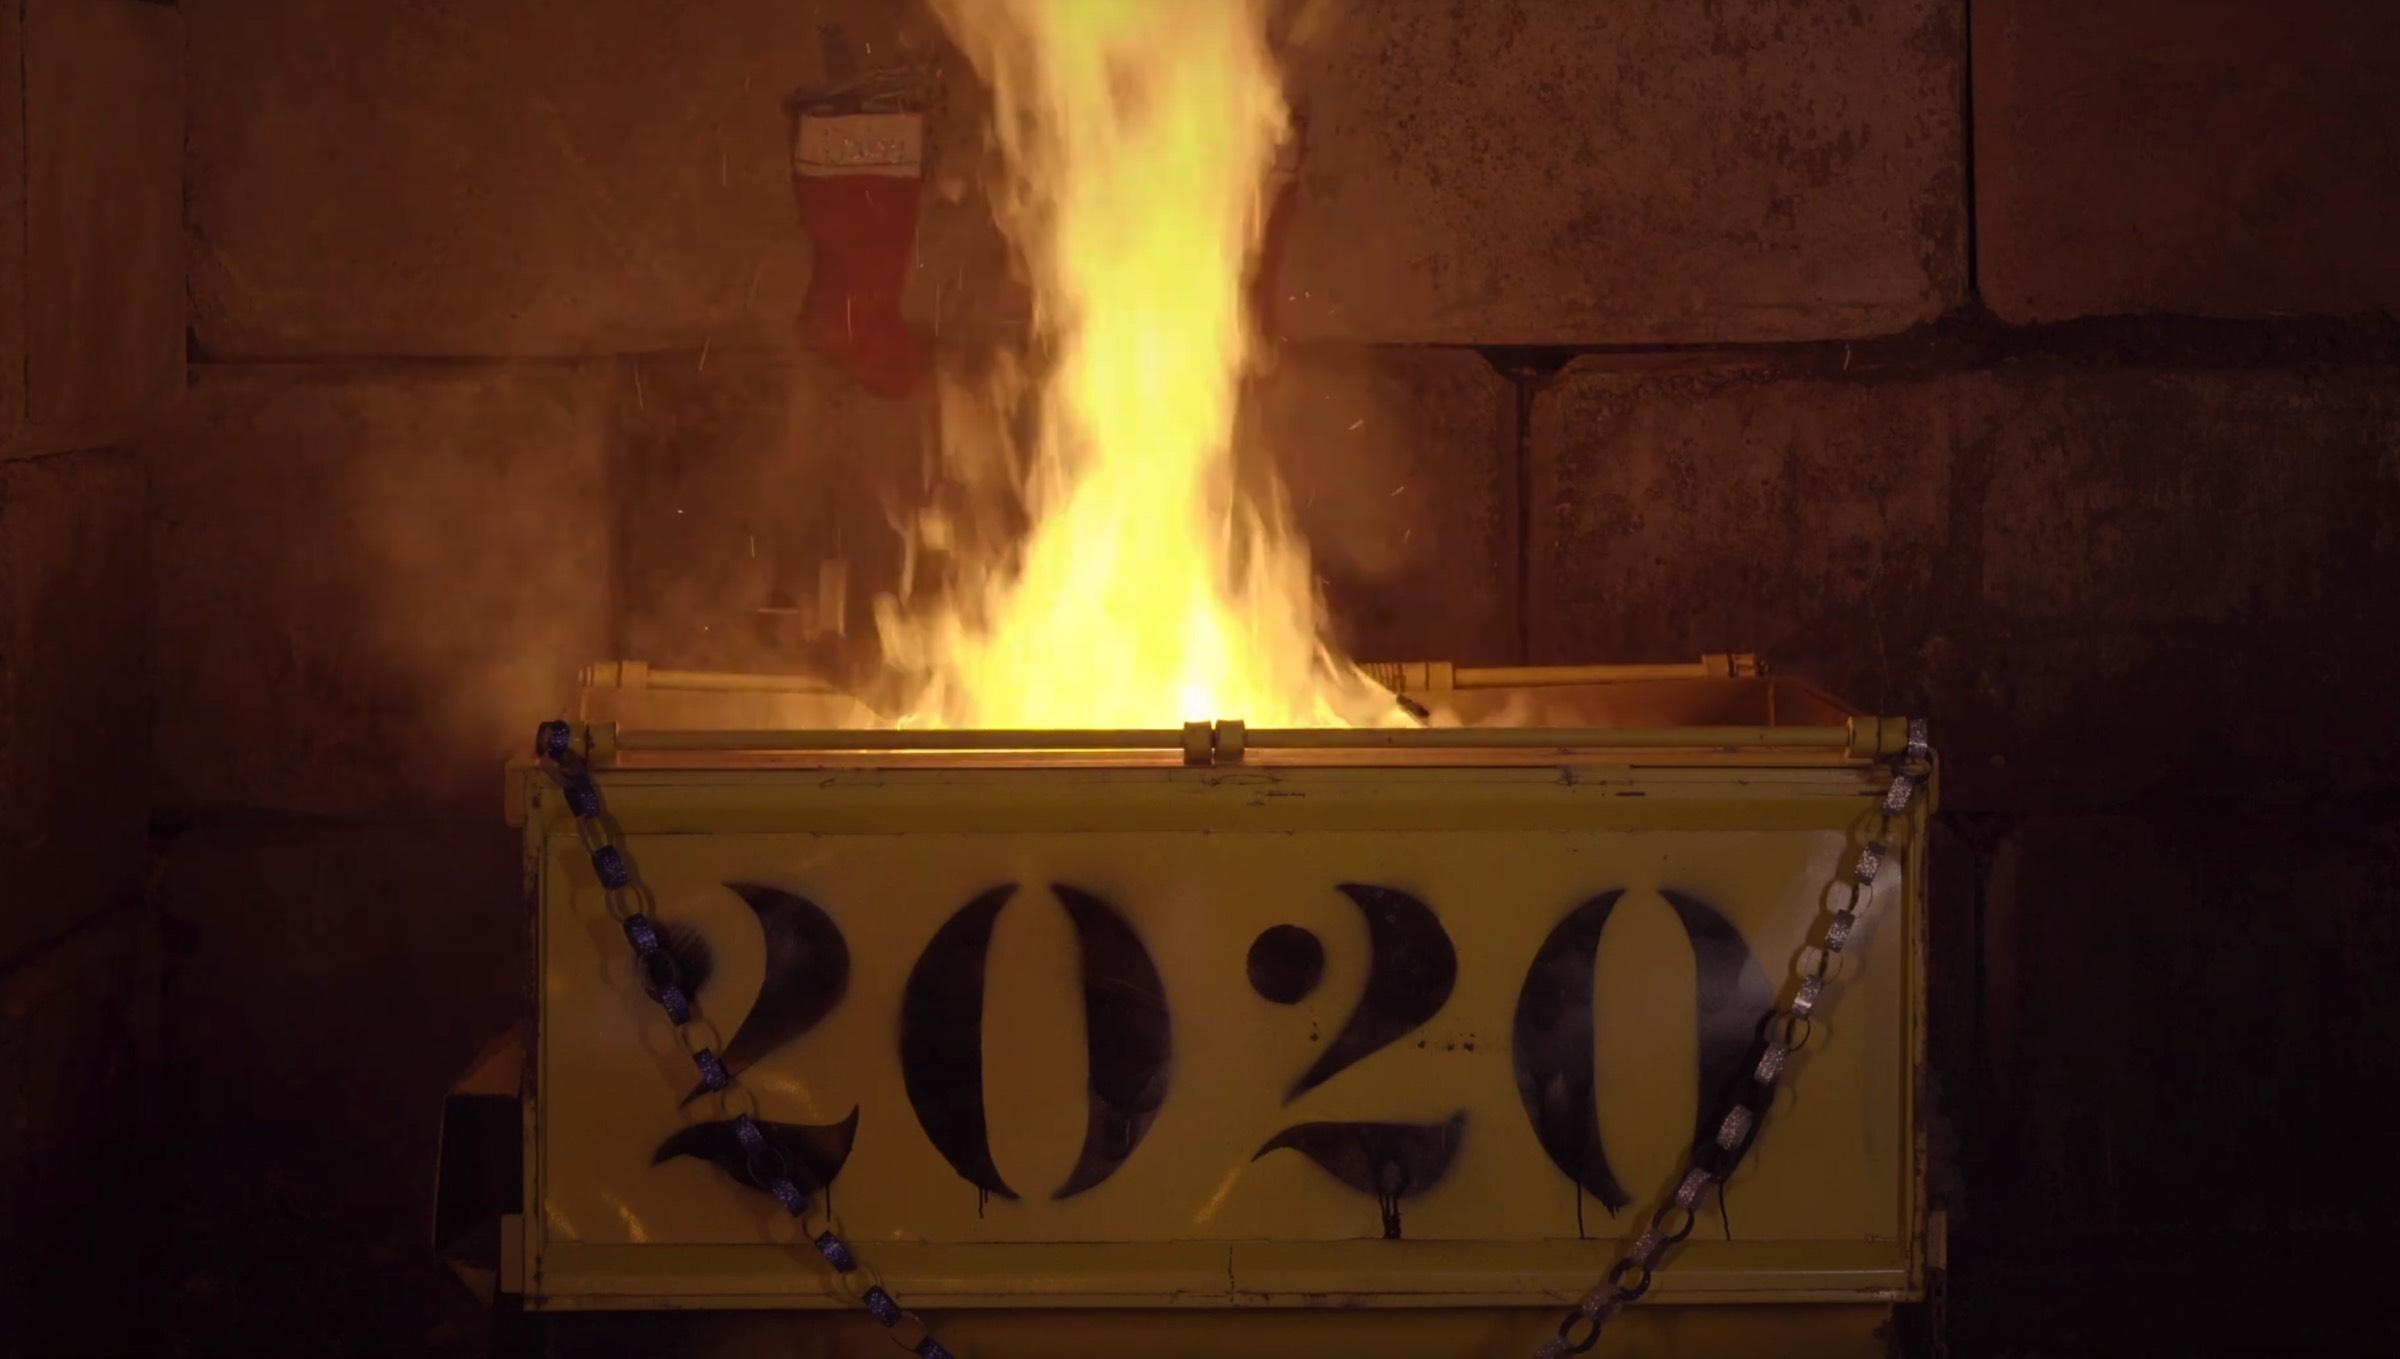 2020dumpsterfire